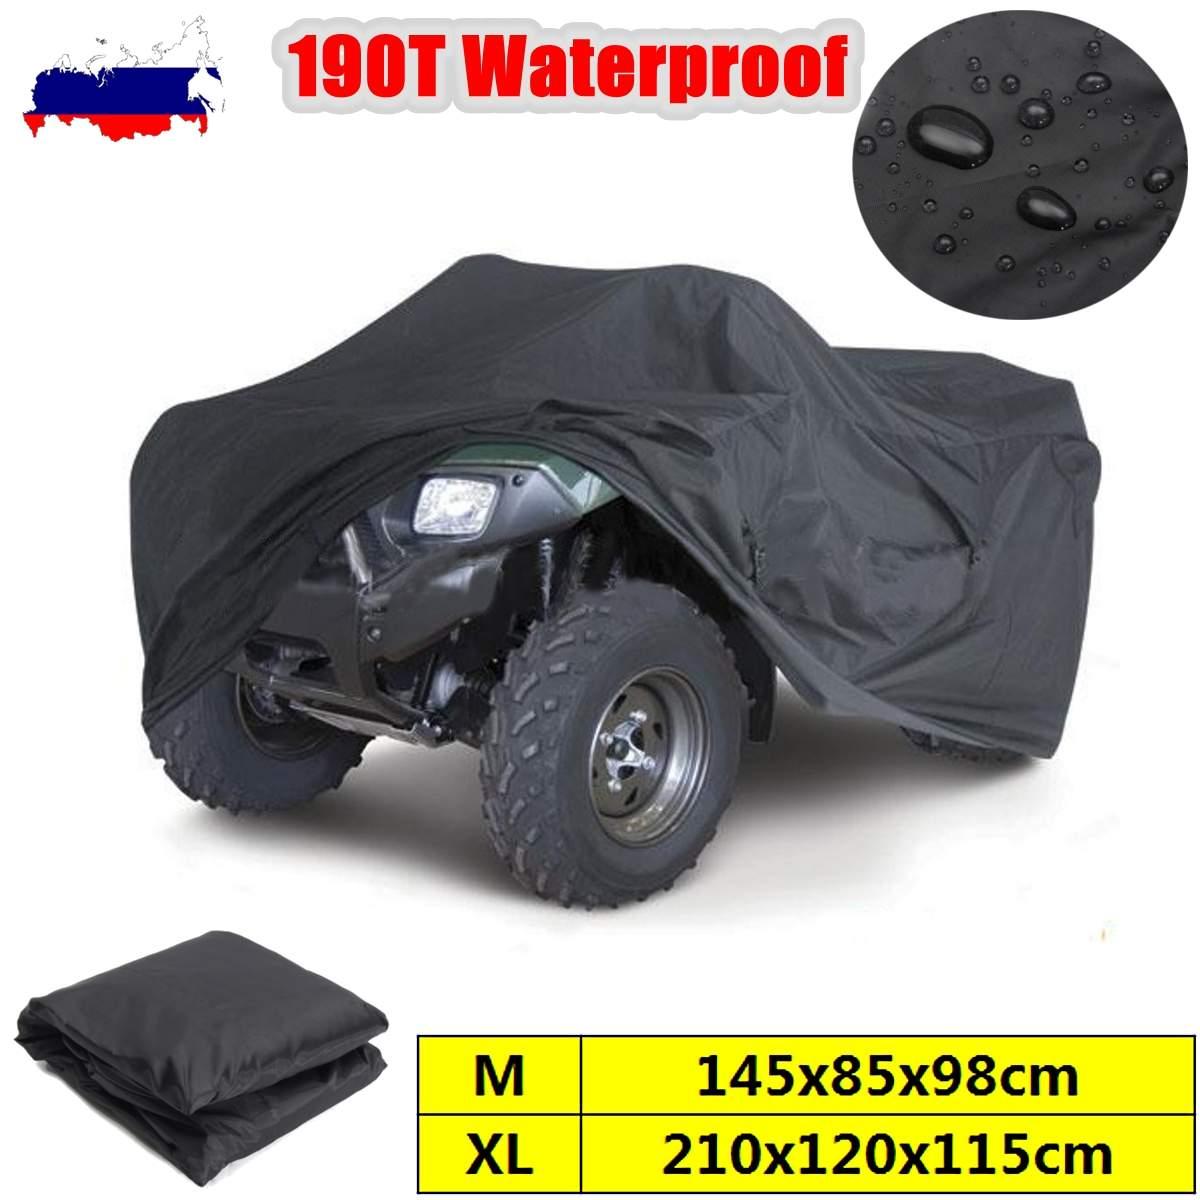 Quad Bike ATV Cover Black M/XL 190T Waterproof Cover Quad ATV Vehicle Scooter Motorbike Universal